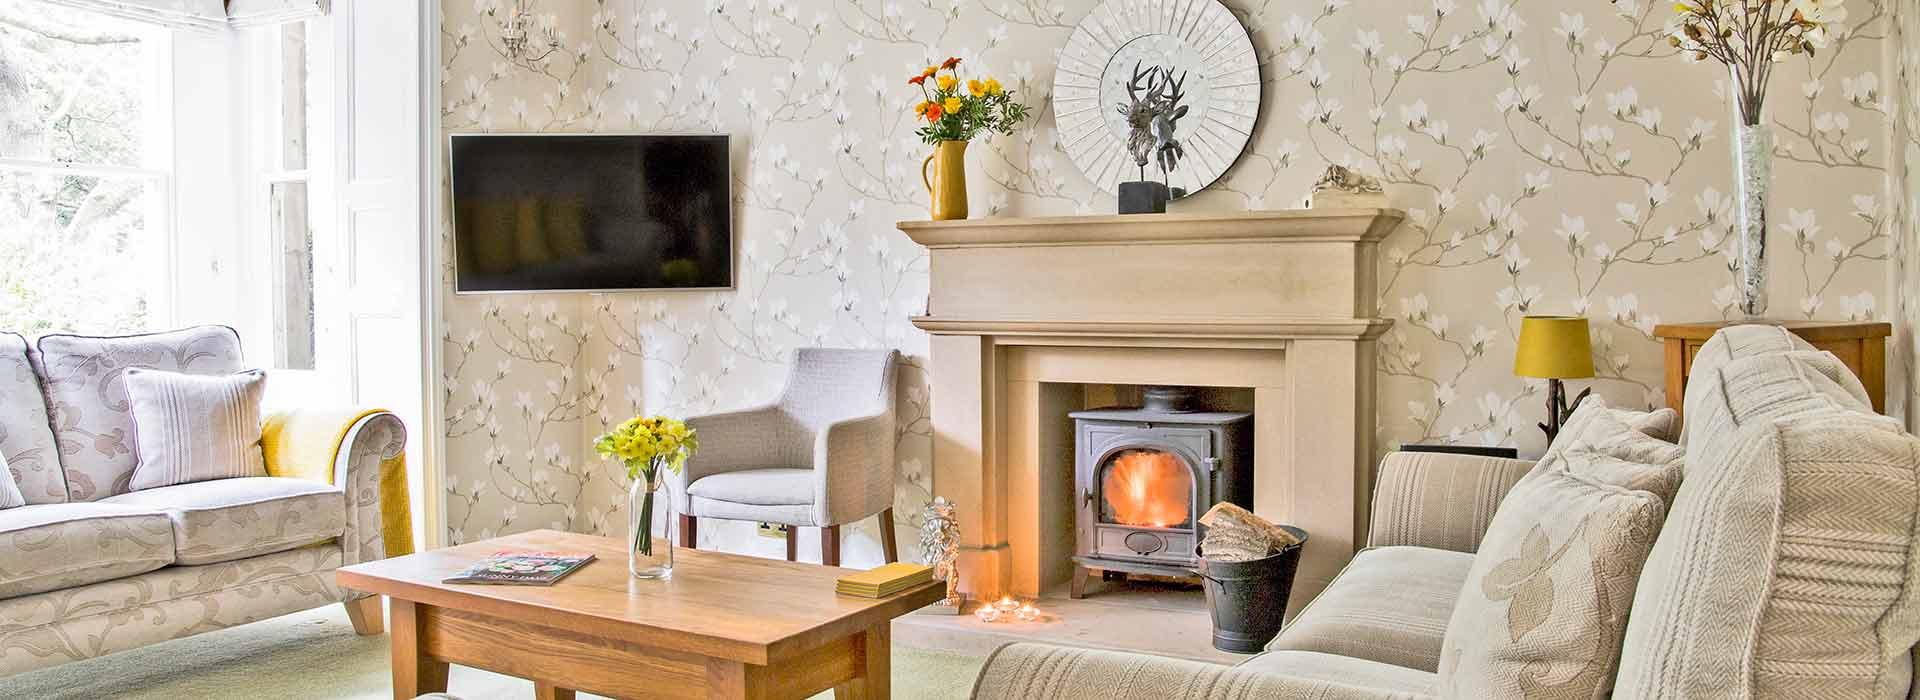 Large sitting room with wood burner